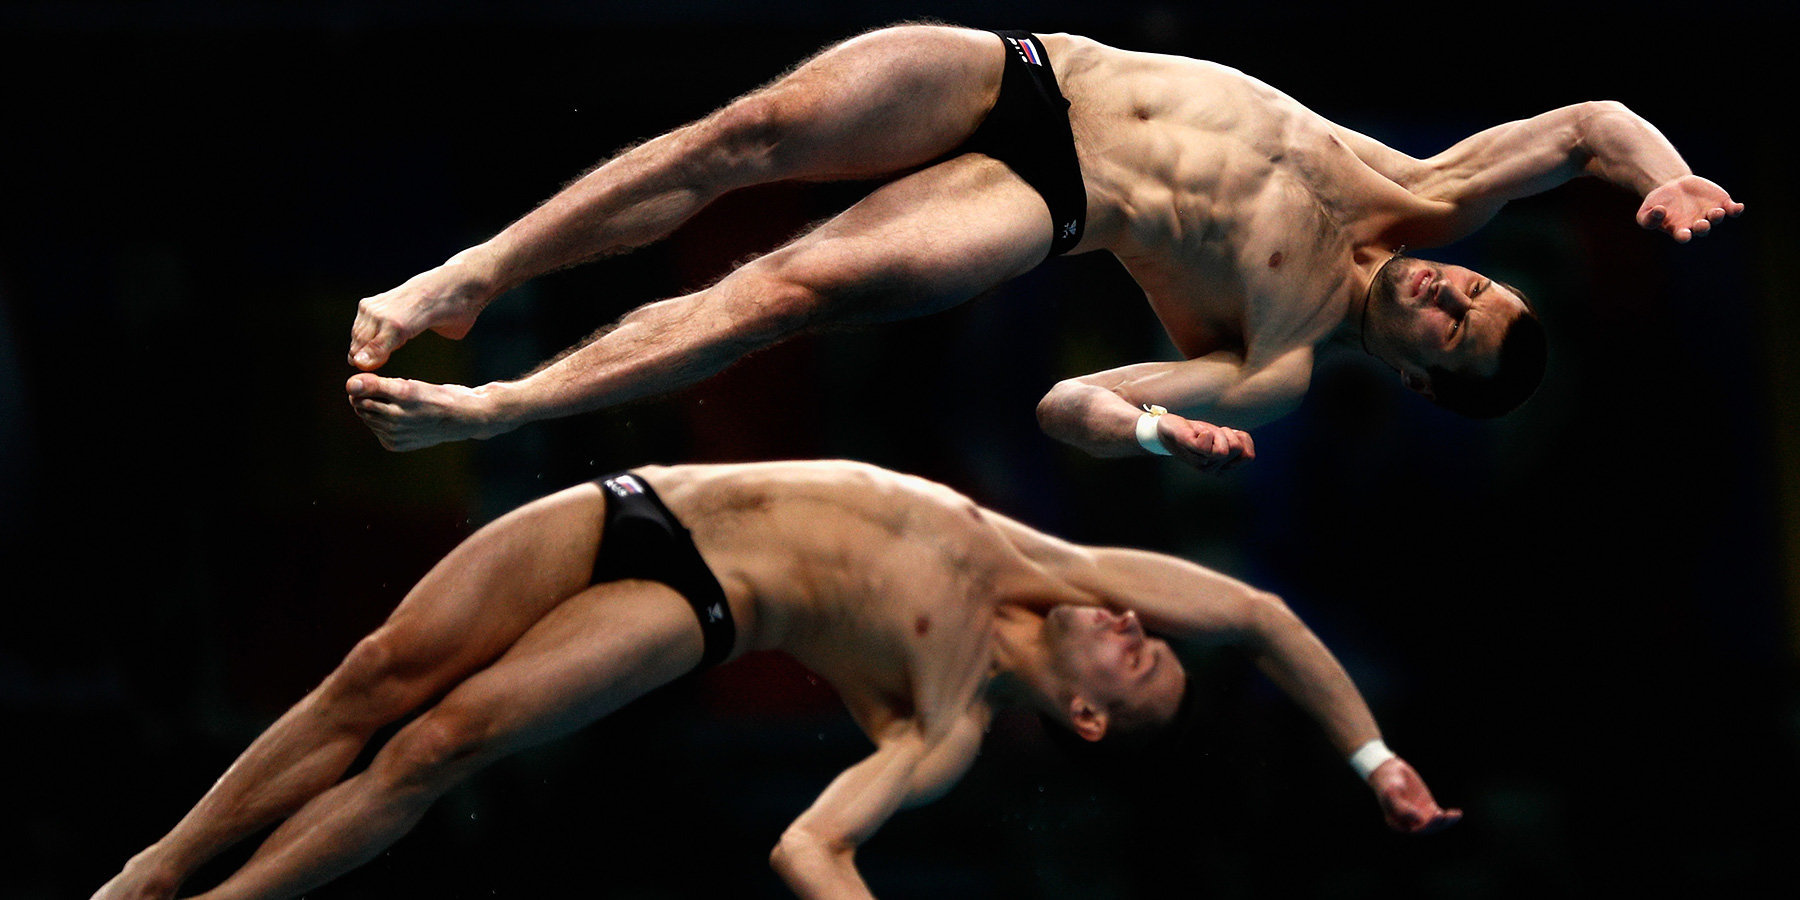 спорт допинг фото